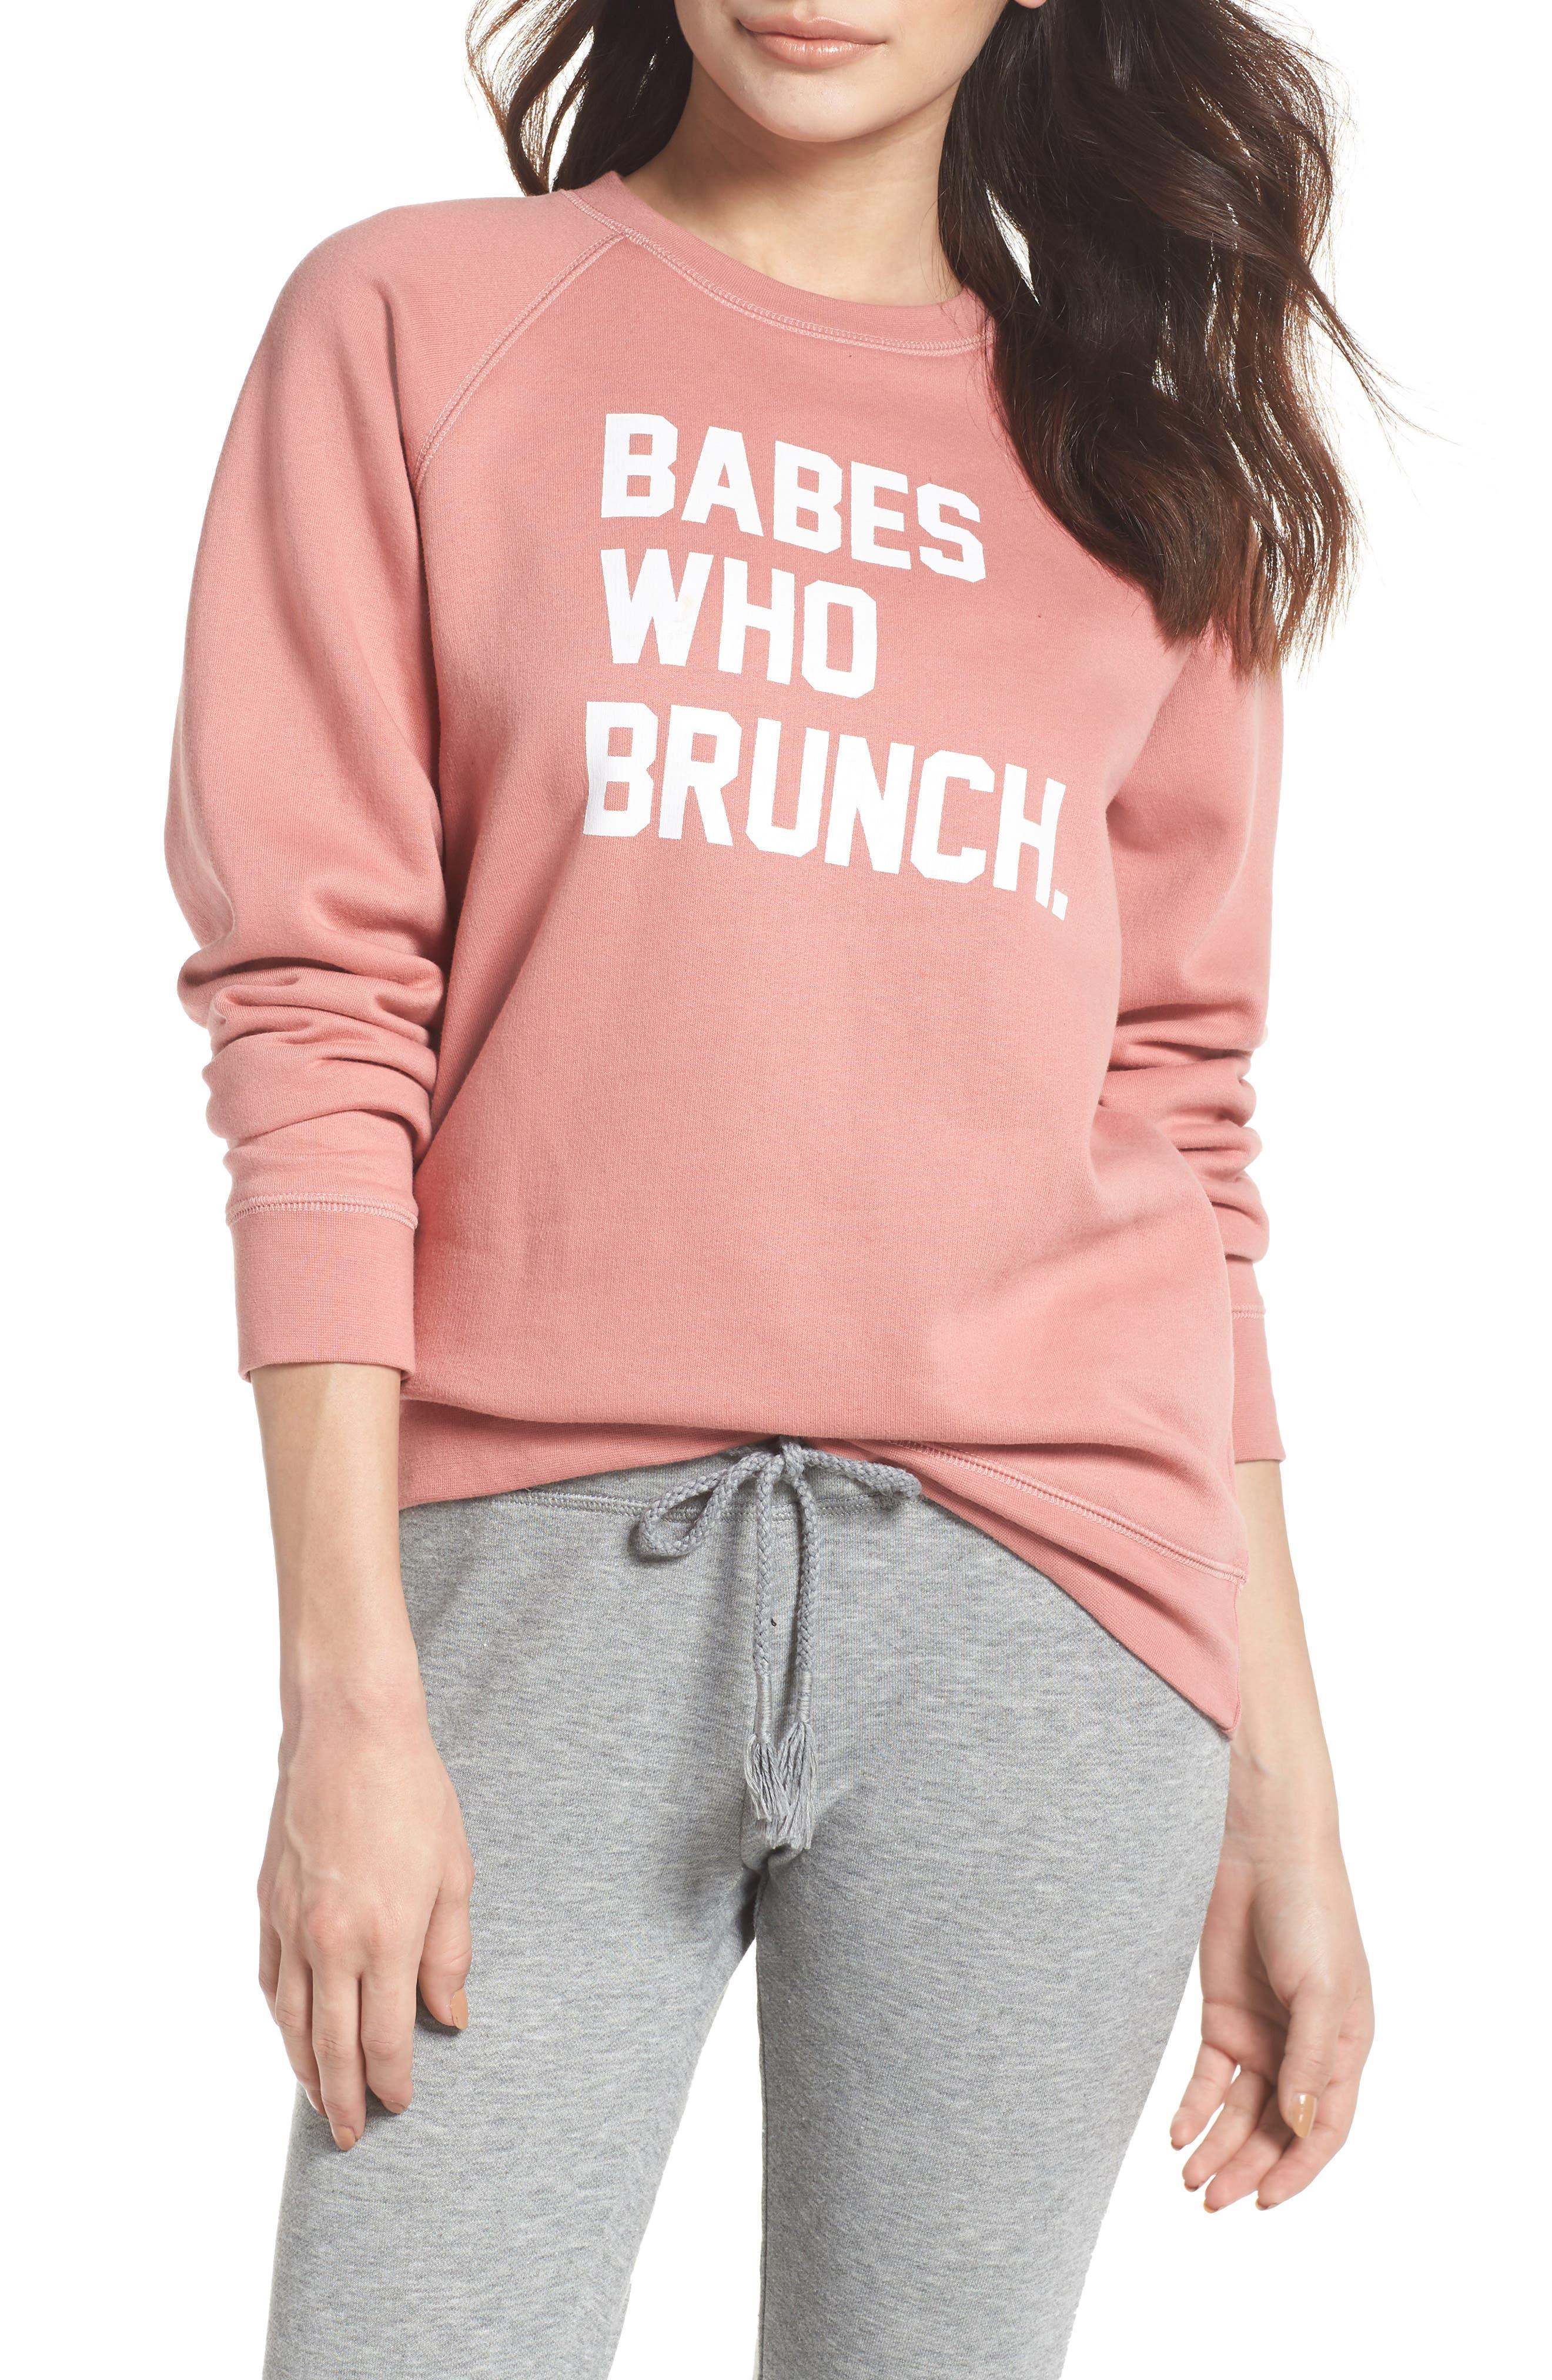 Babes Who Brunch Sweatshirt,                             Main thumbnail 1, color,                             955